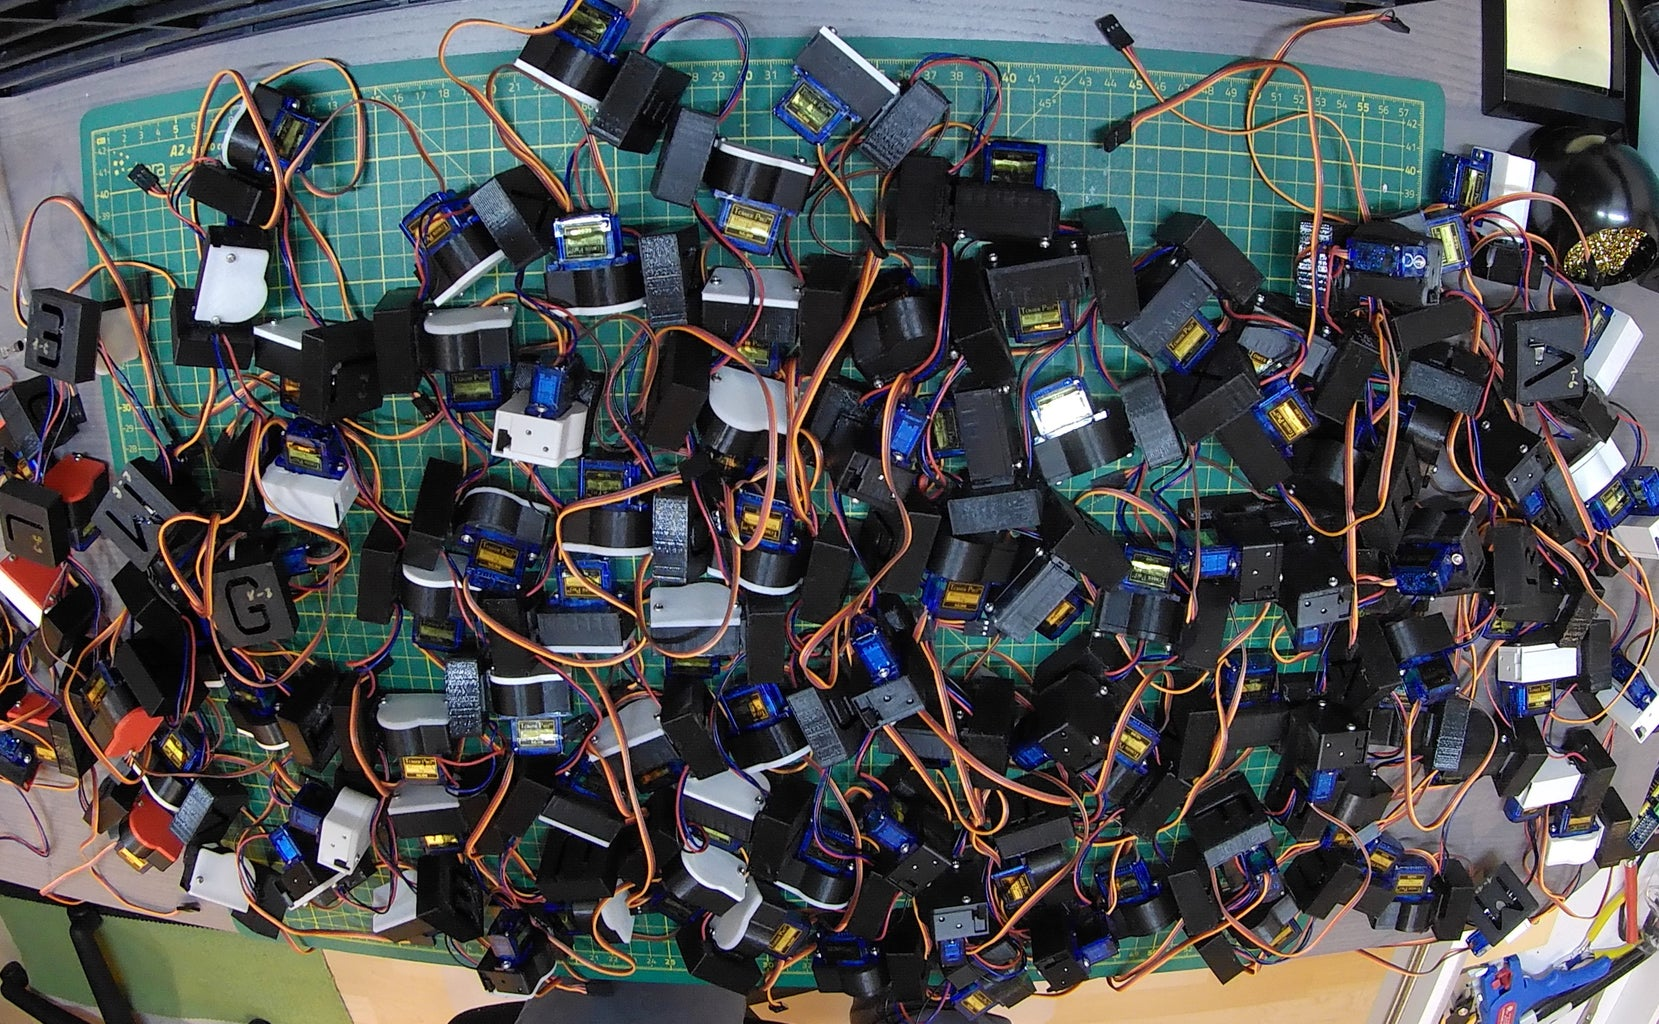 Assembling the Actuators